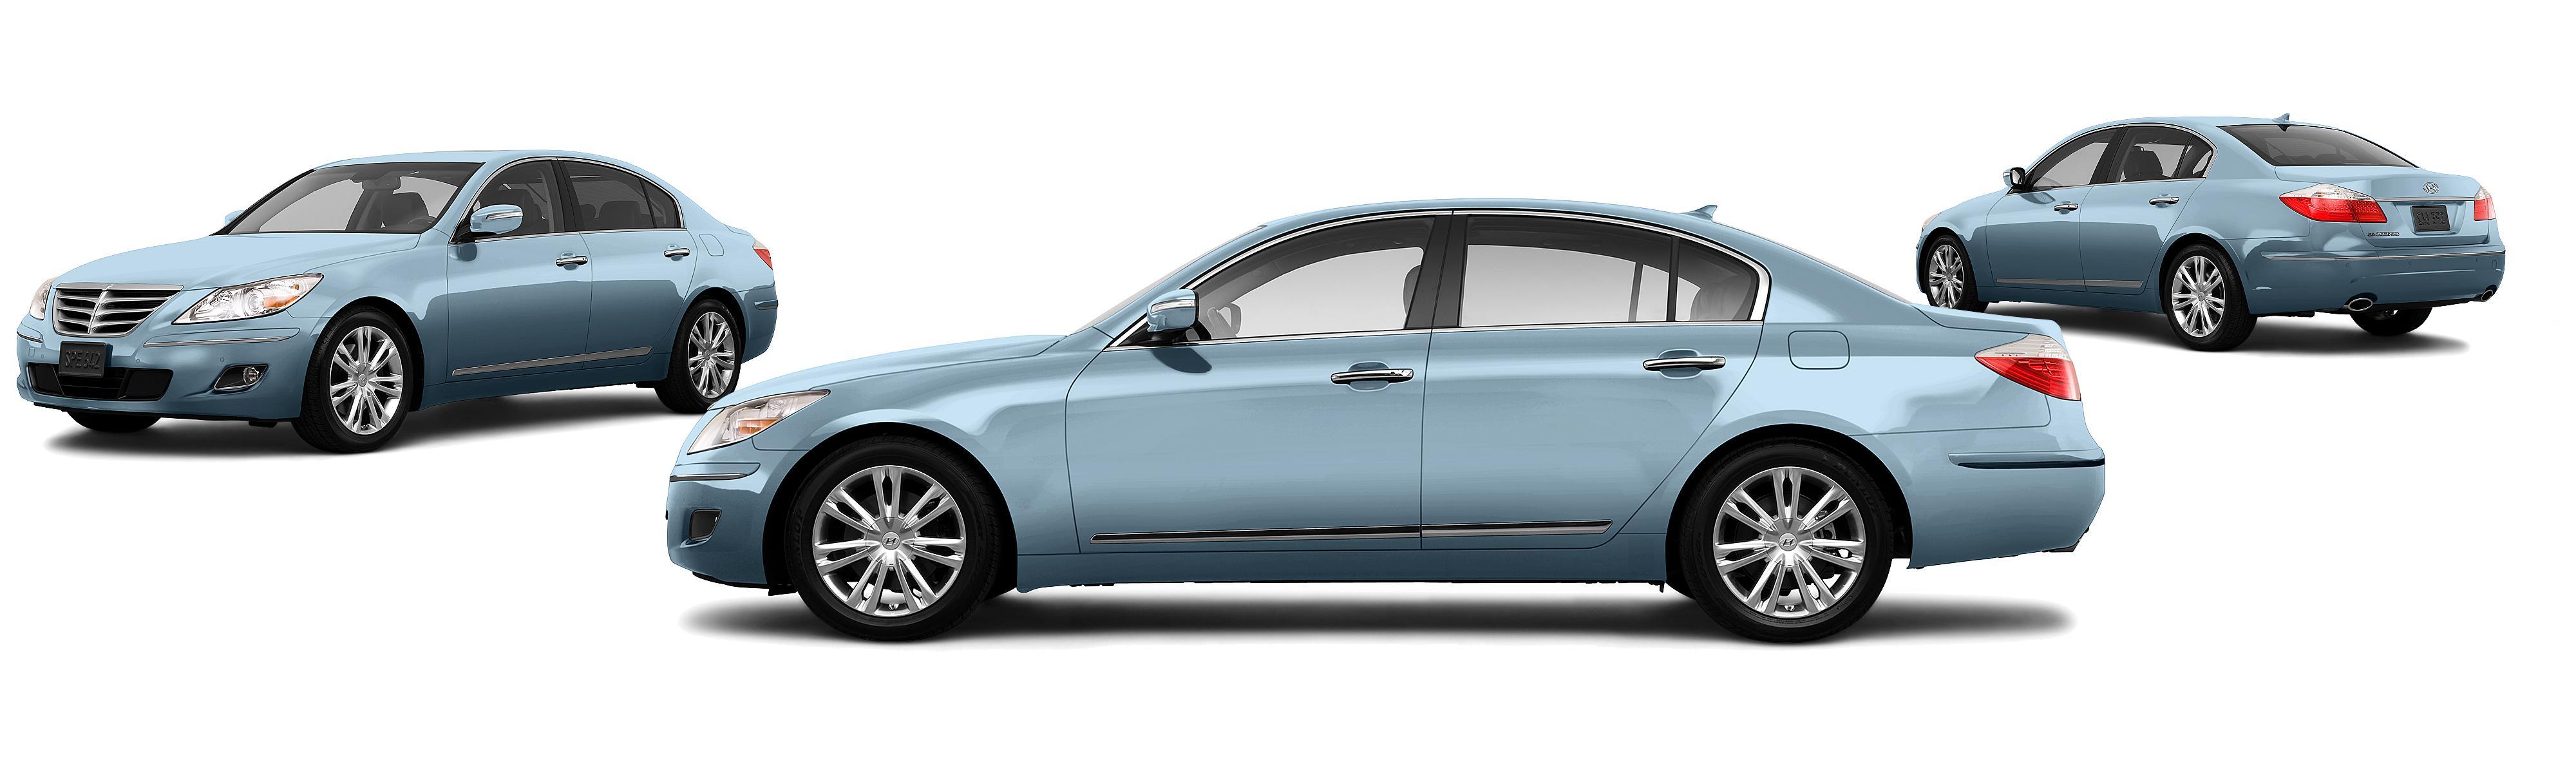 2010 Hyundai Genesis 4.6L V8 4dr Sedan - Research - GrooveCar on